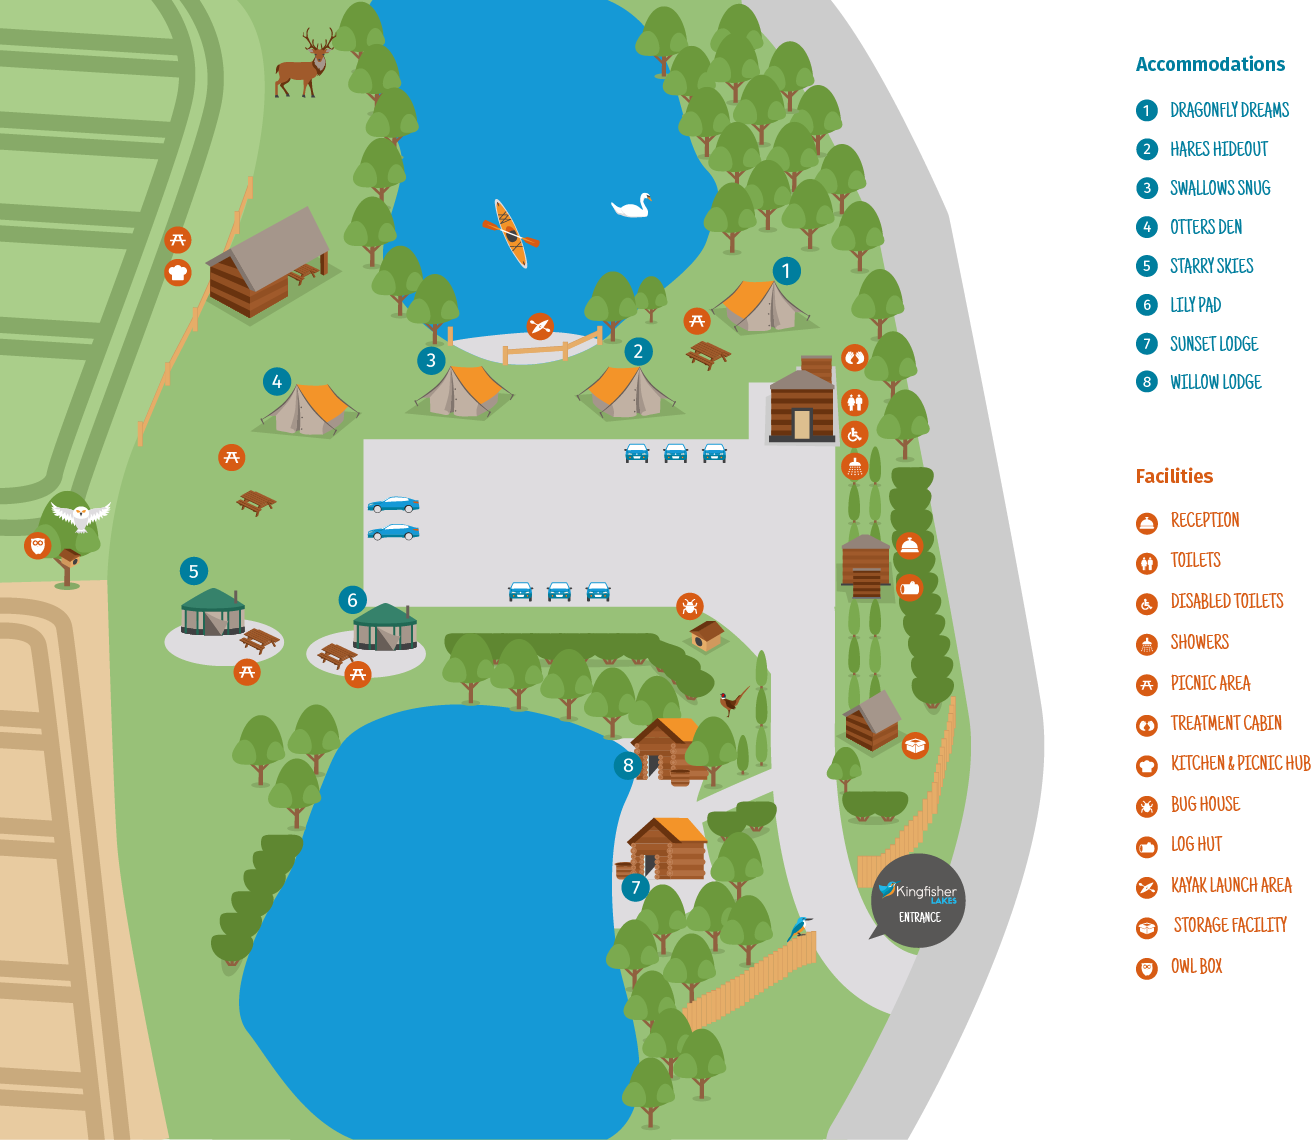 map of accomodation